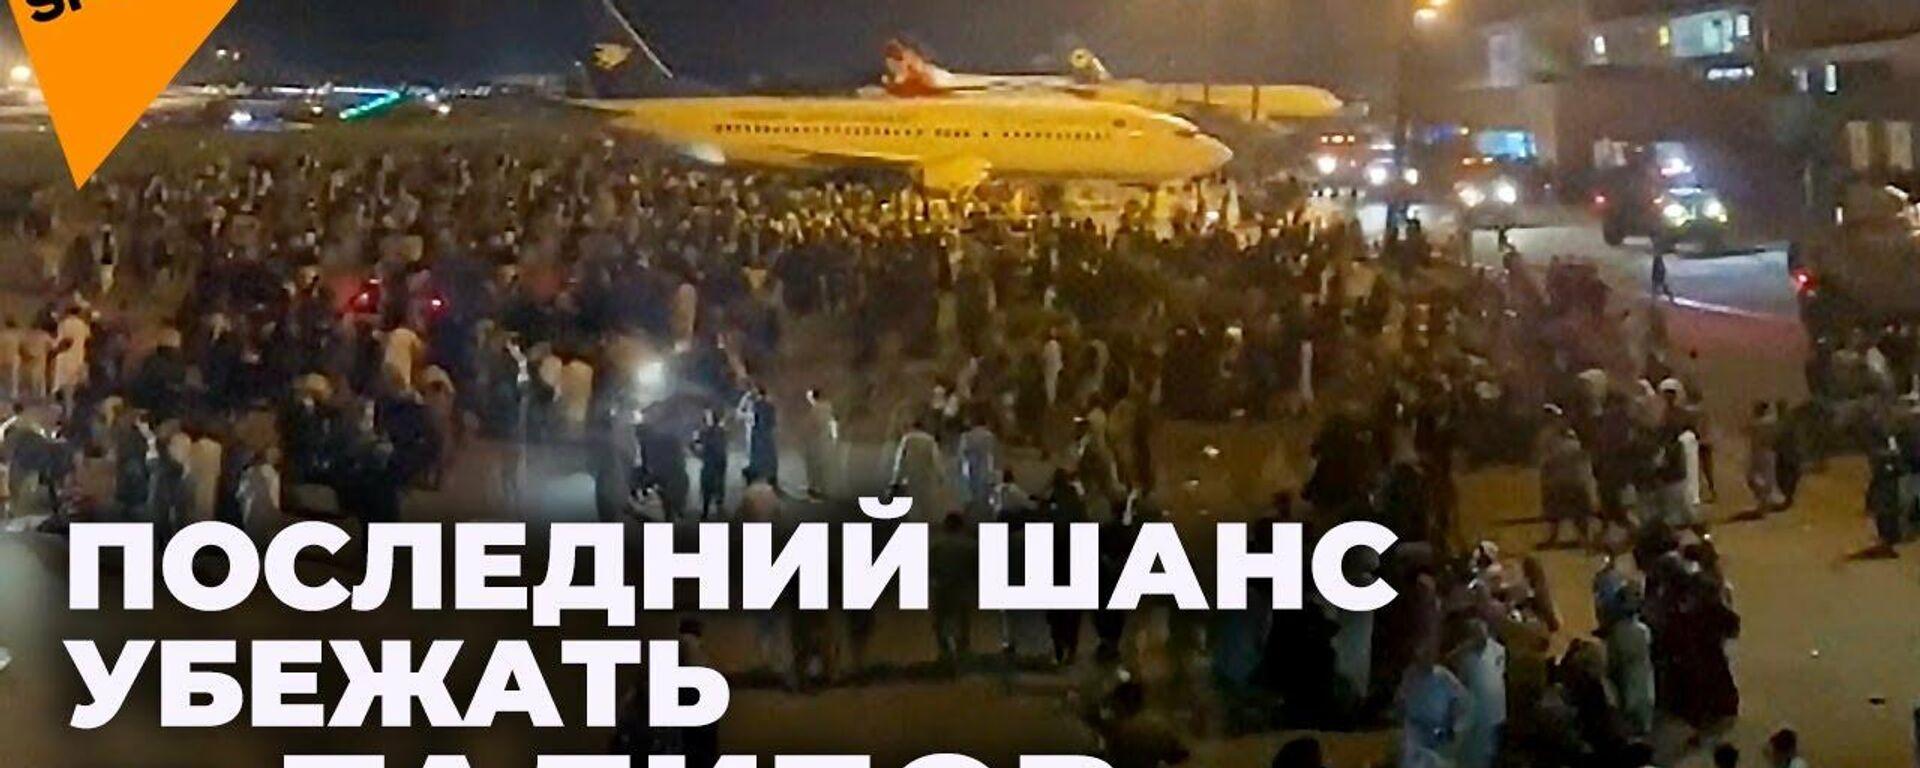 Davka i panika: kak lyudi shturmuyut aeroport Kabula v nadejde ubejat iz Afganistana  - Sputnik Oʻzbekiston, 1920, 17.08.2021